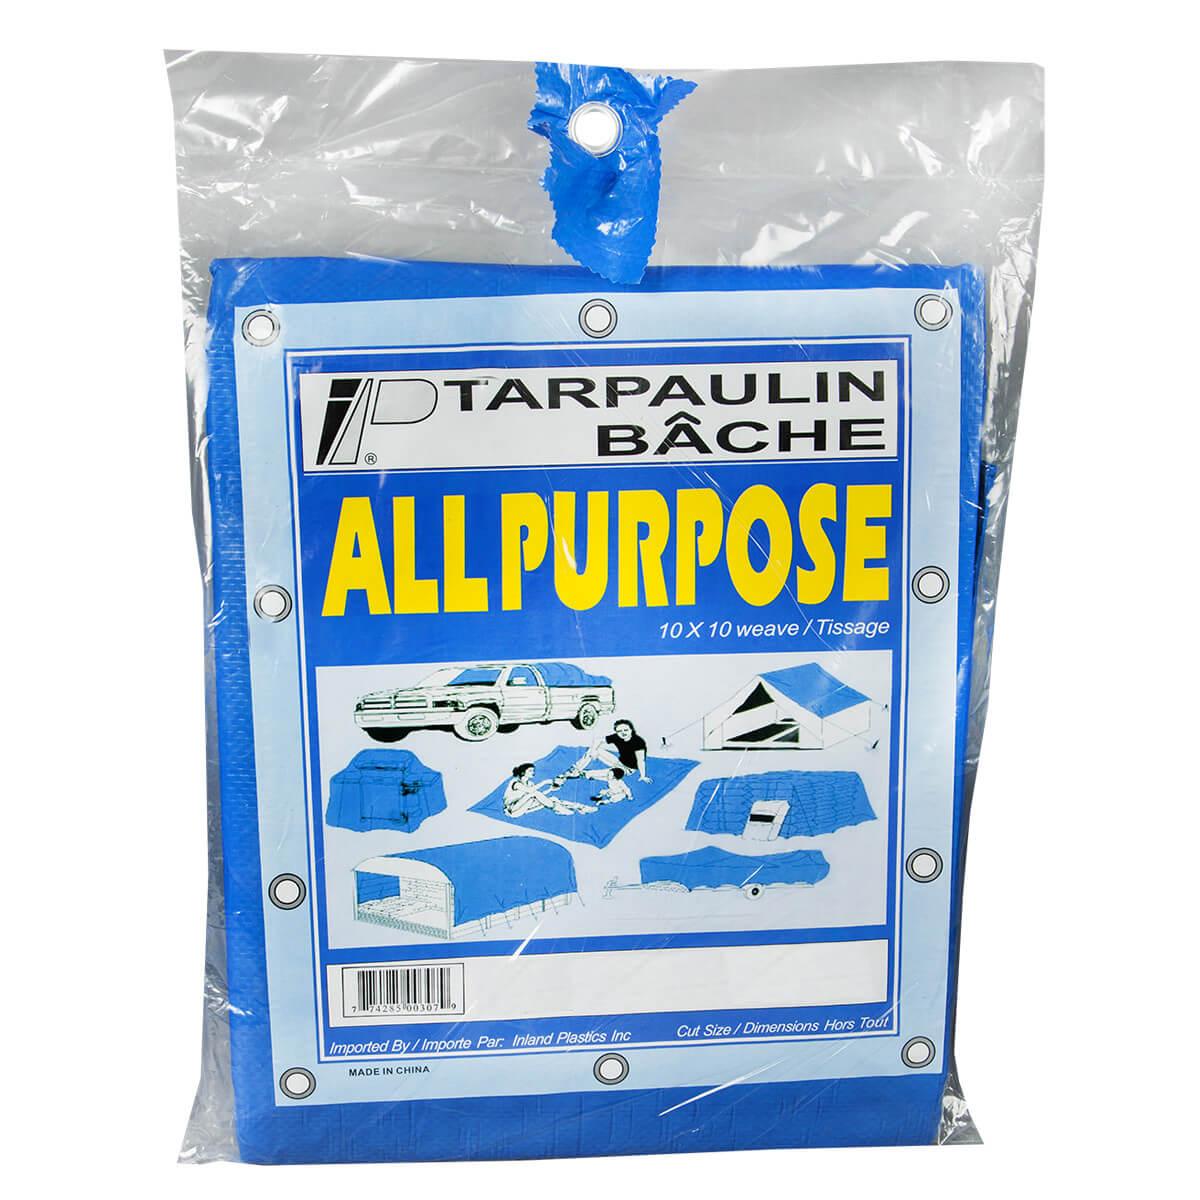 All Purpose Blue Utility Tarps - 10' x 12'